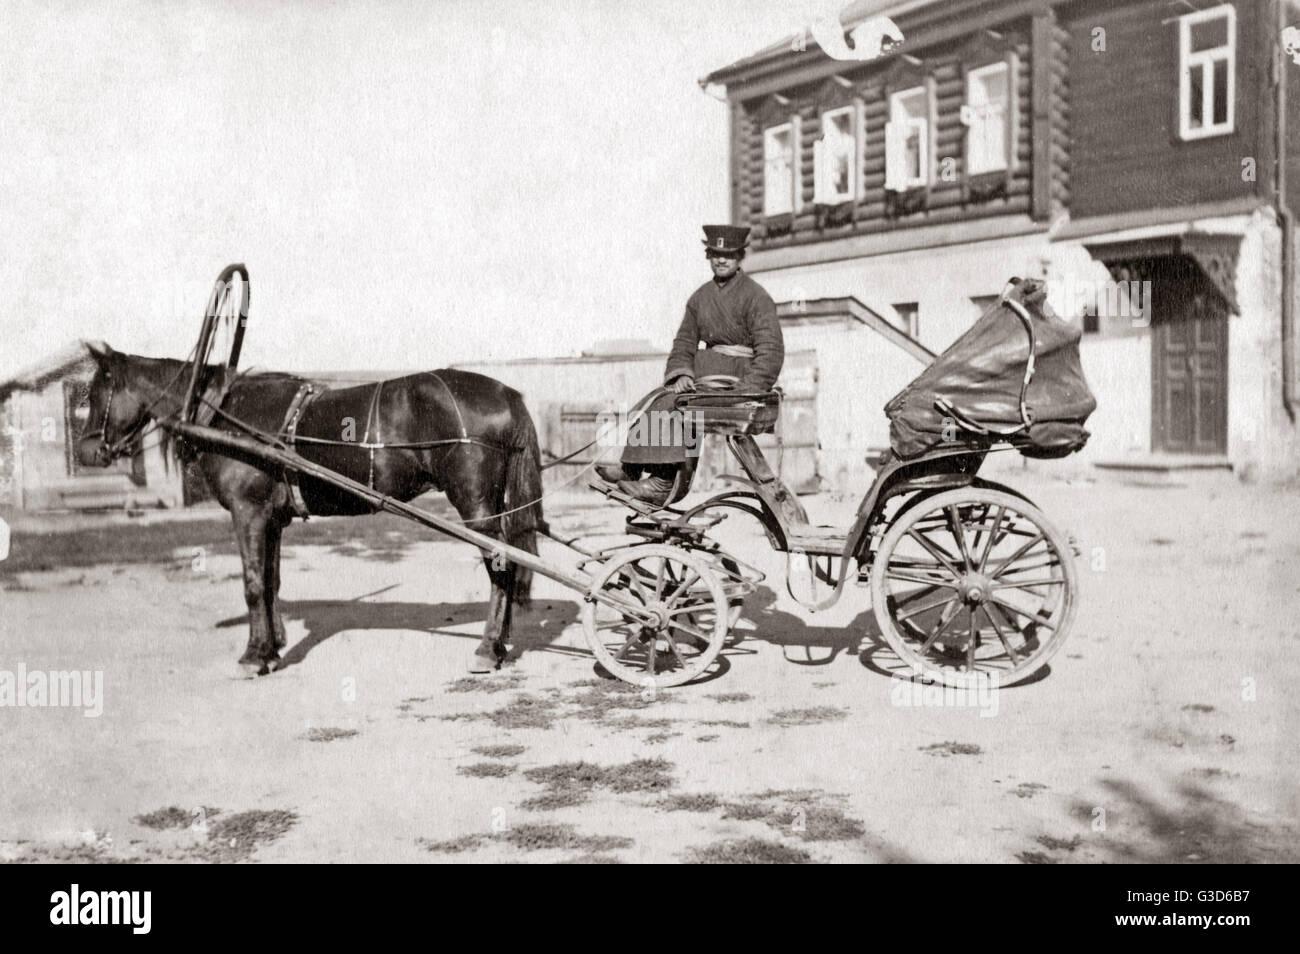 Hackney carriage or droshky, Russia, circa 1890.     Date: circa 1890 - Stock Image